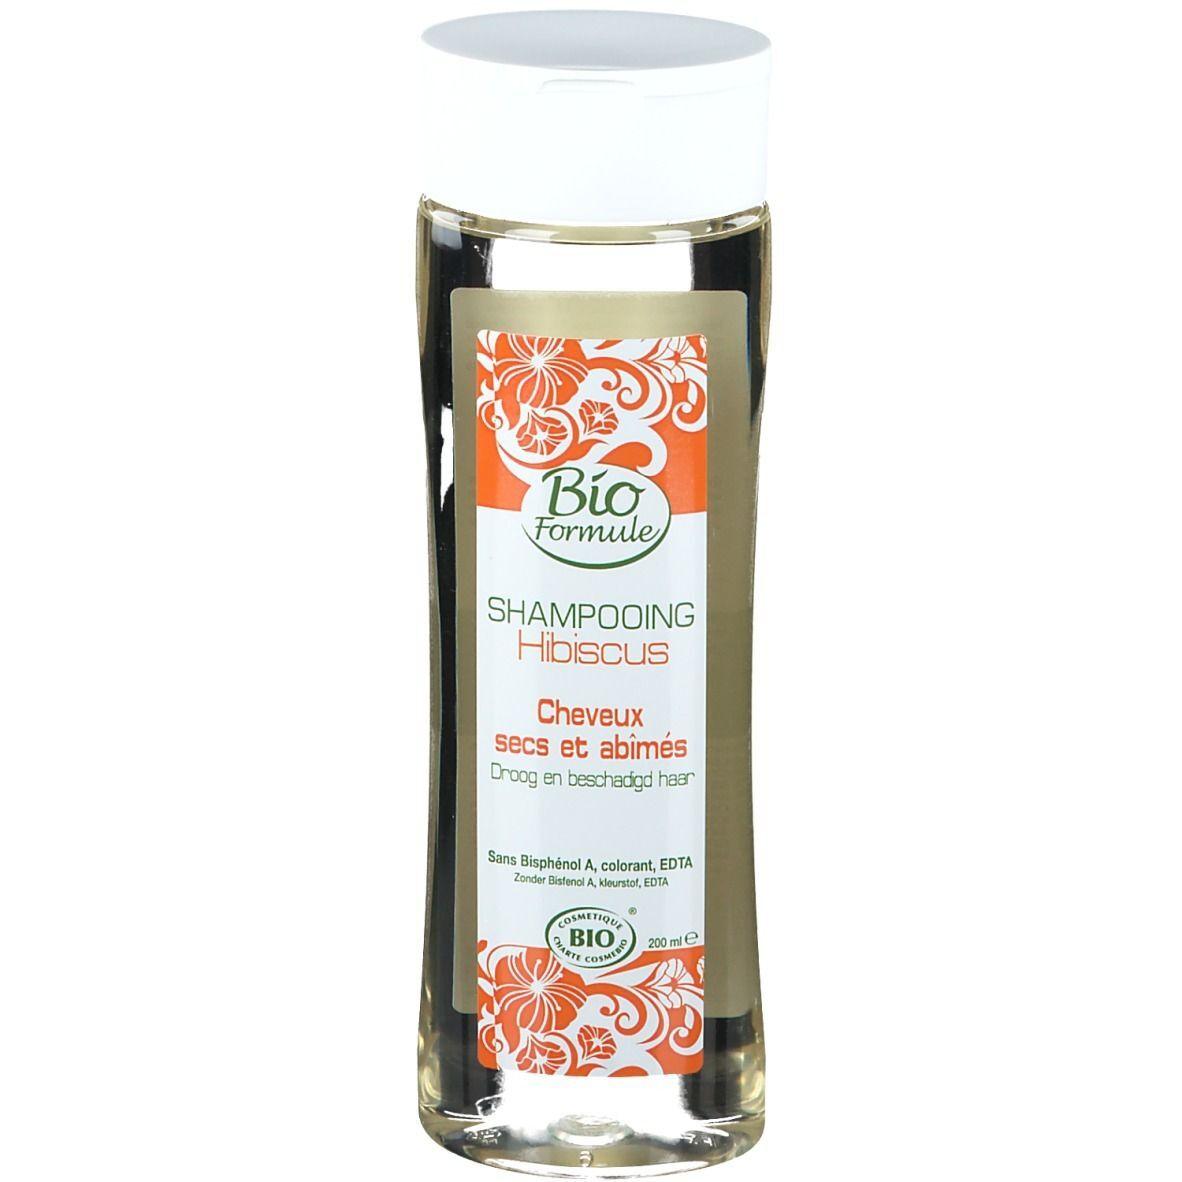 Bio Formule Shampooing Hibiscus ml shampooing